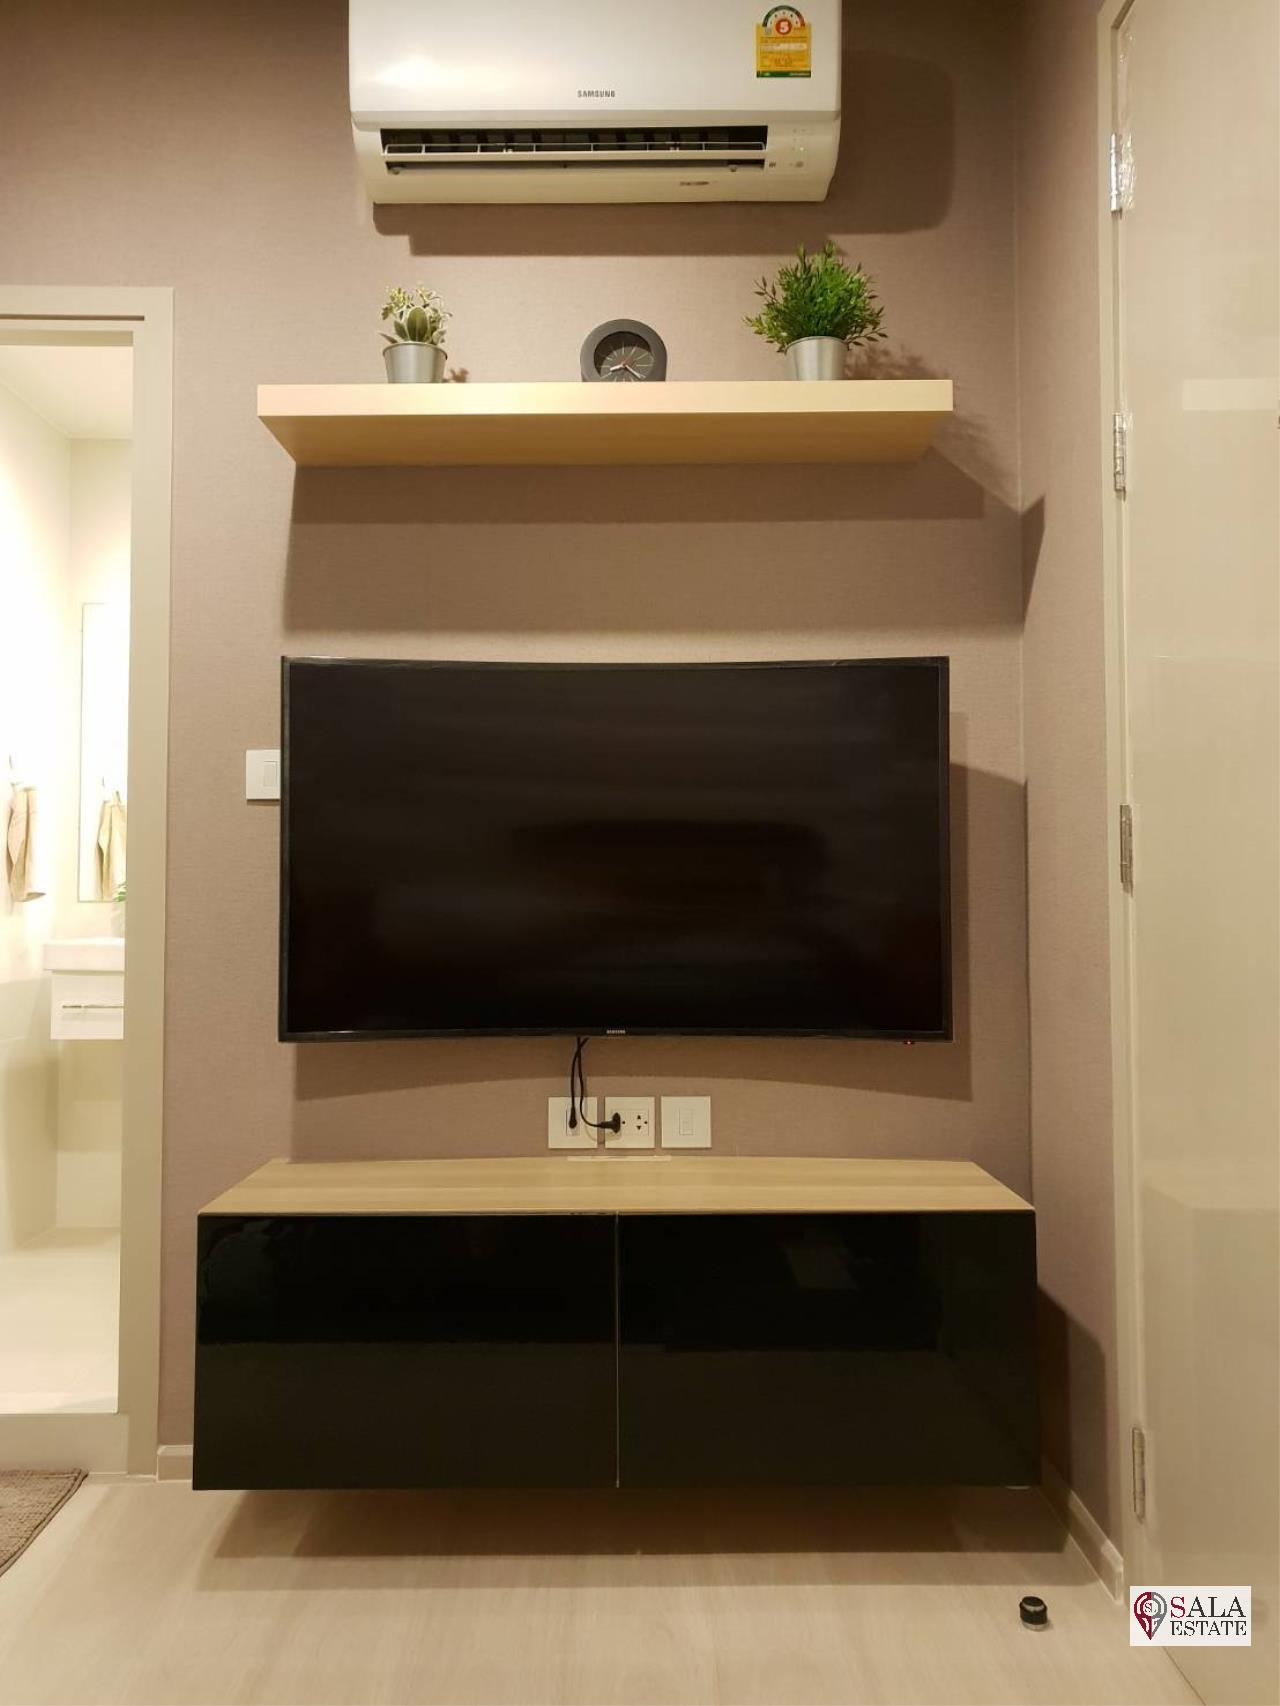 SALA ESTATE Agency's ( SELL WITH TENANT ) LIFE SUKHUMVIT 48 – BTS PHRA KHANONG, 1 BEDROOM  BATHROOM 6